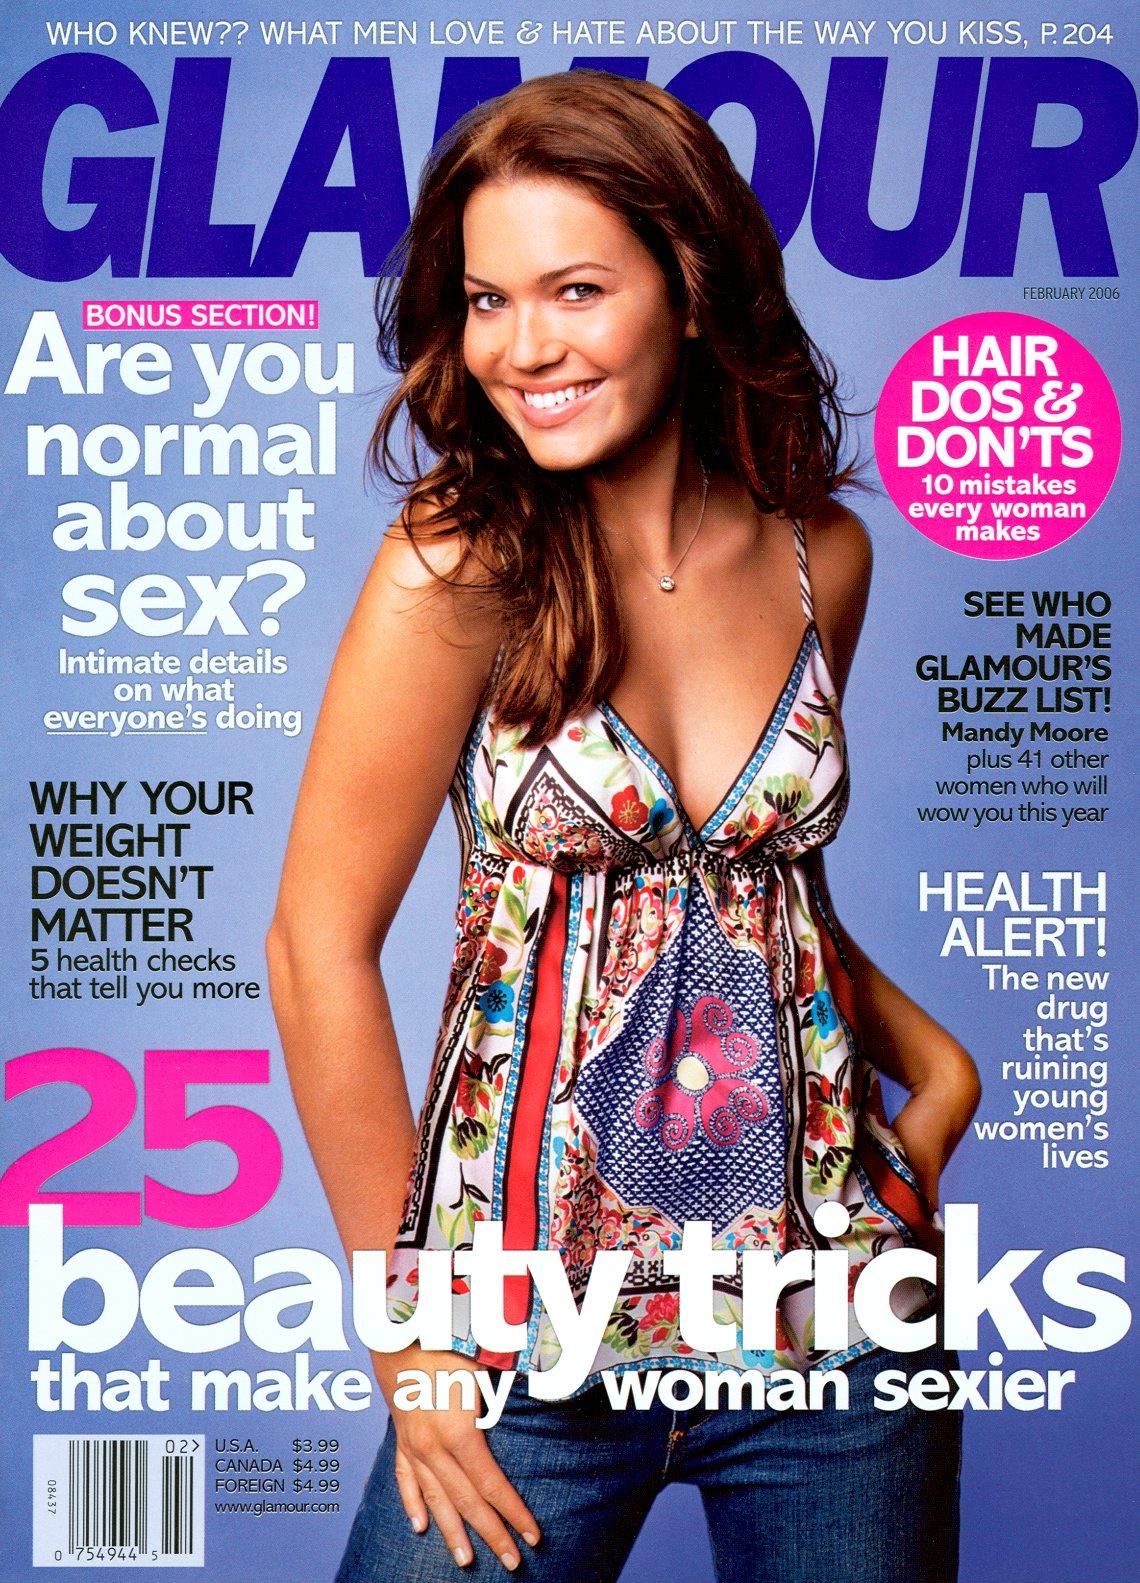 http://4.bp.blogspot.com/_GCAuqodmOE4/TRJnShJlXNI/AAAAAAAAF6o/neLJjf1lnCY/s1600/Sexiest+Mandy+Moore++%252812%2529.jpg